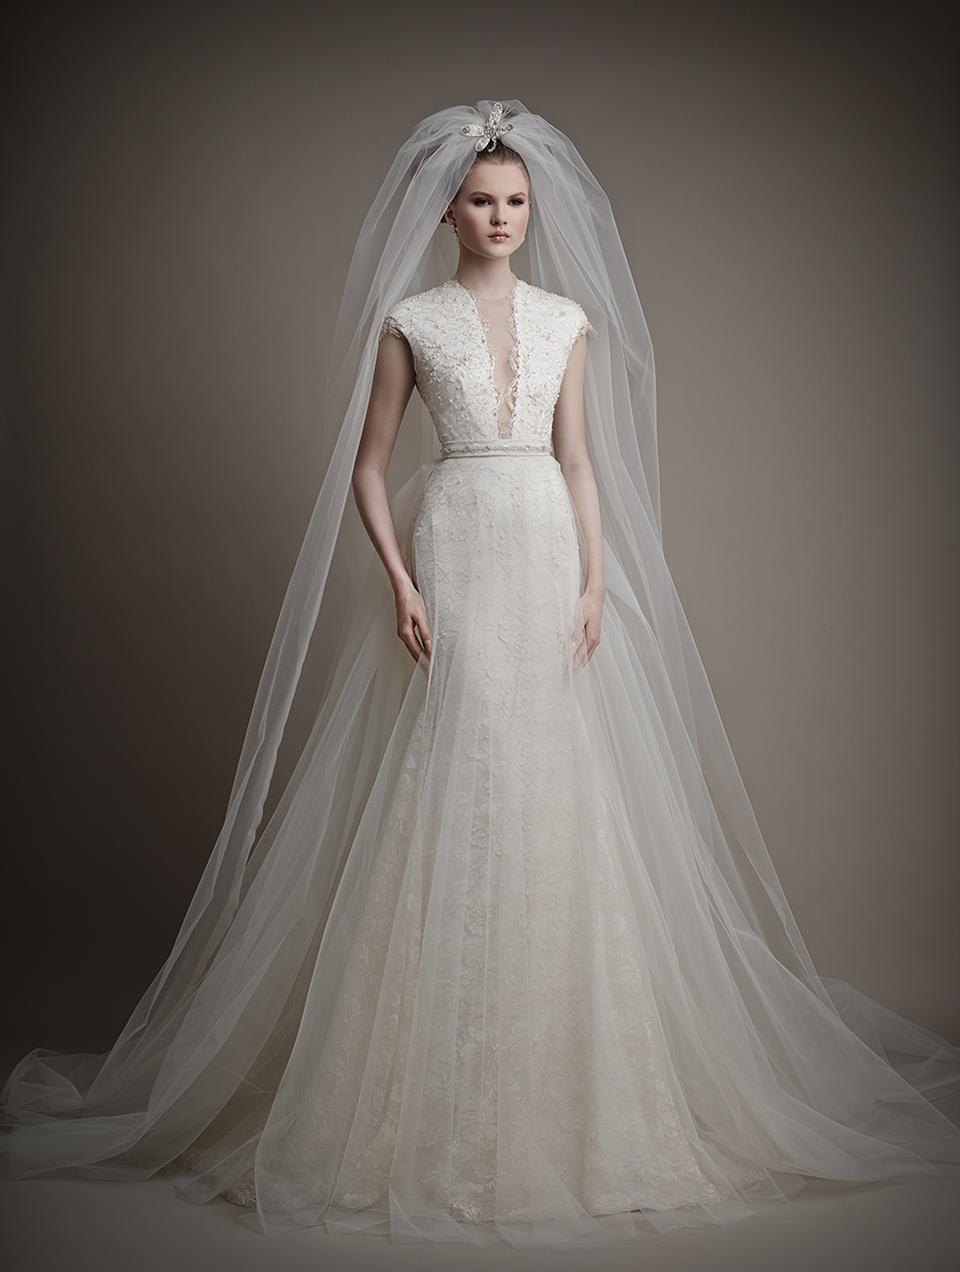 Ersa Atelier's 2015 Bridal Collection - Didda Wedding Dress